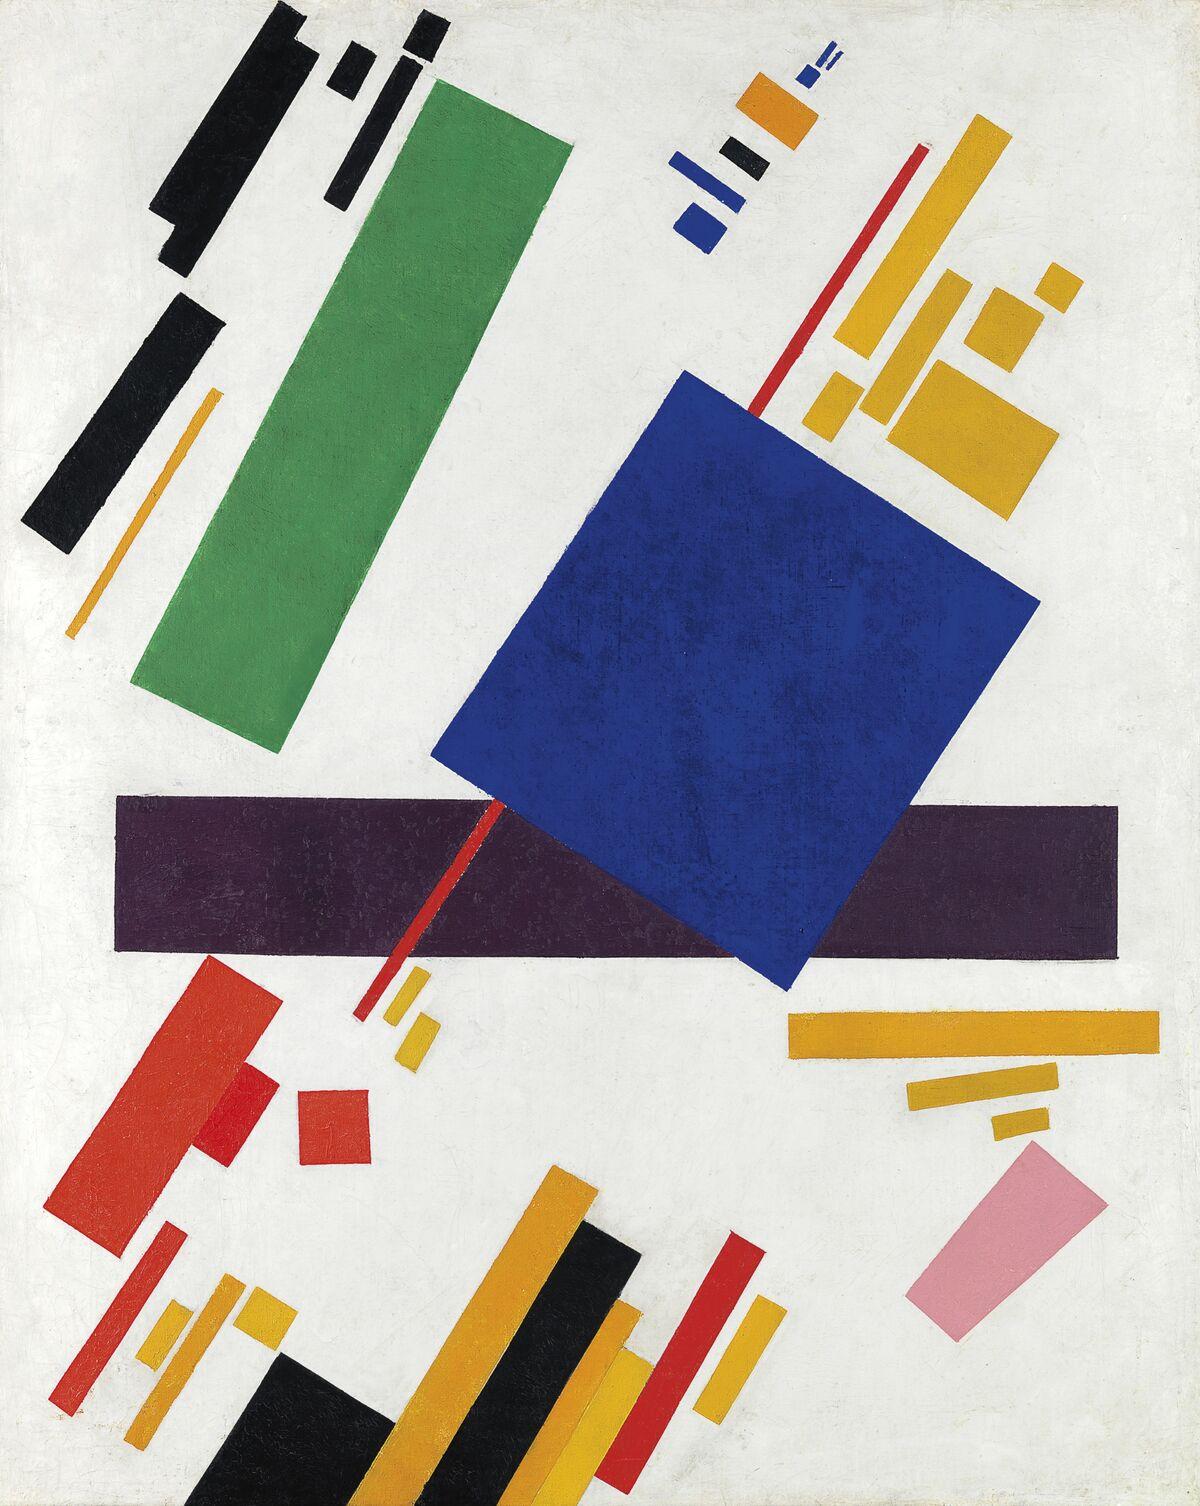 Kazimir Malevich, Suprematist Composition, 1916. Courtesy of Christie's.